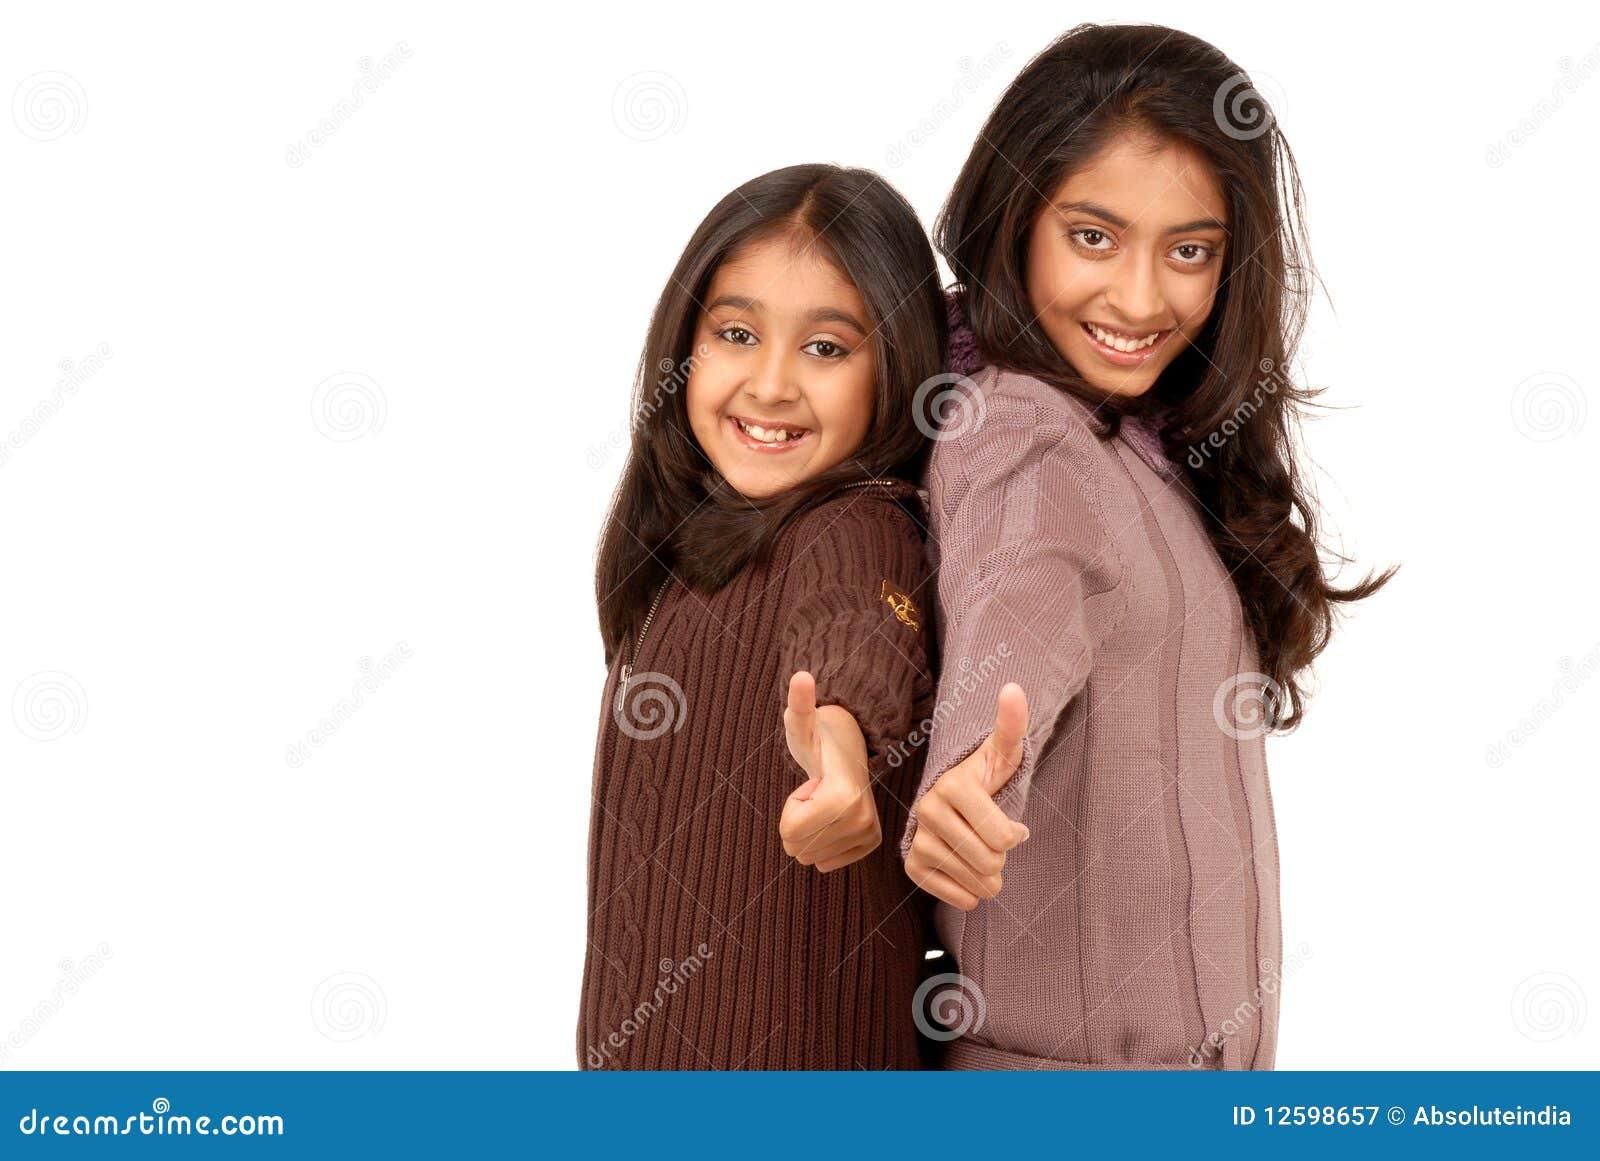 t girls thumbs